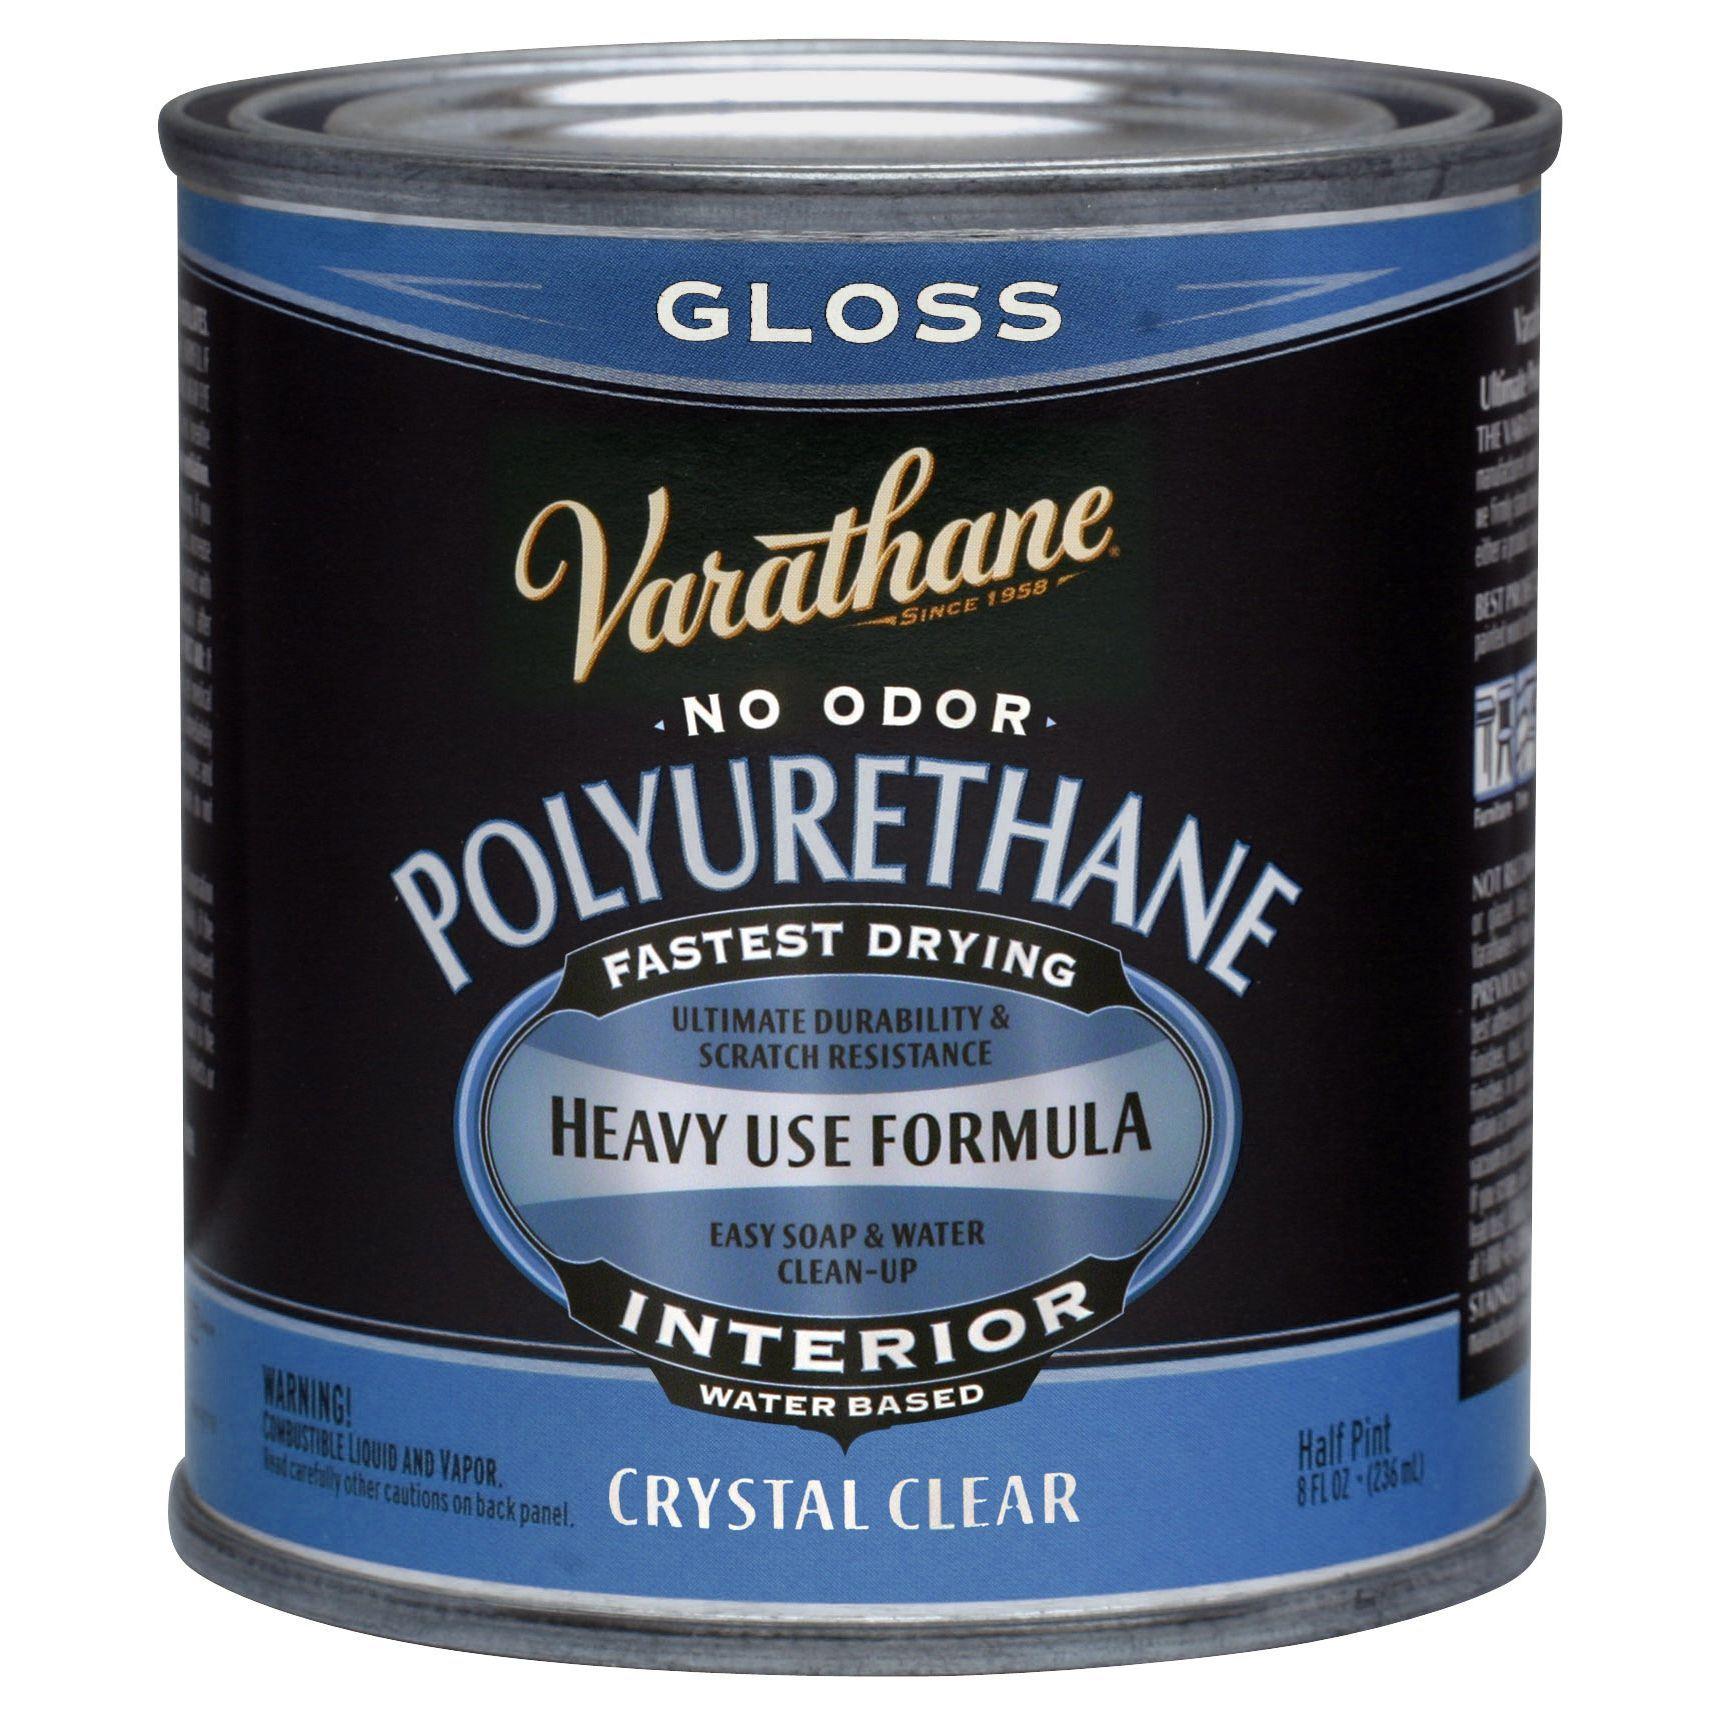 Varathane 200061h 1 2 Pt Gls Interior Water Based Diamond